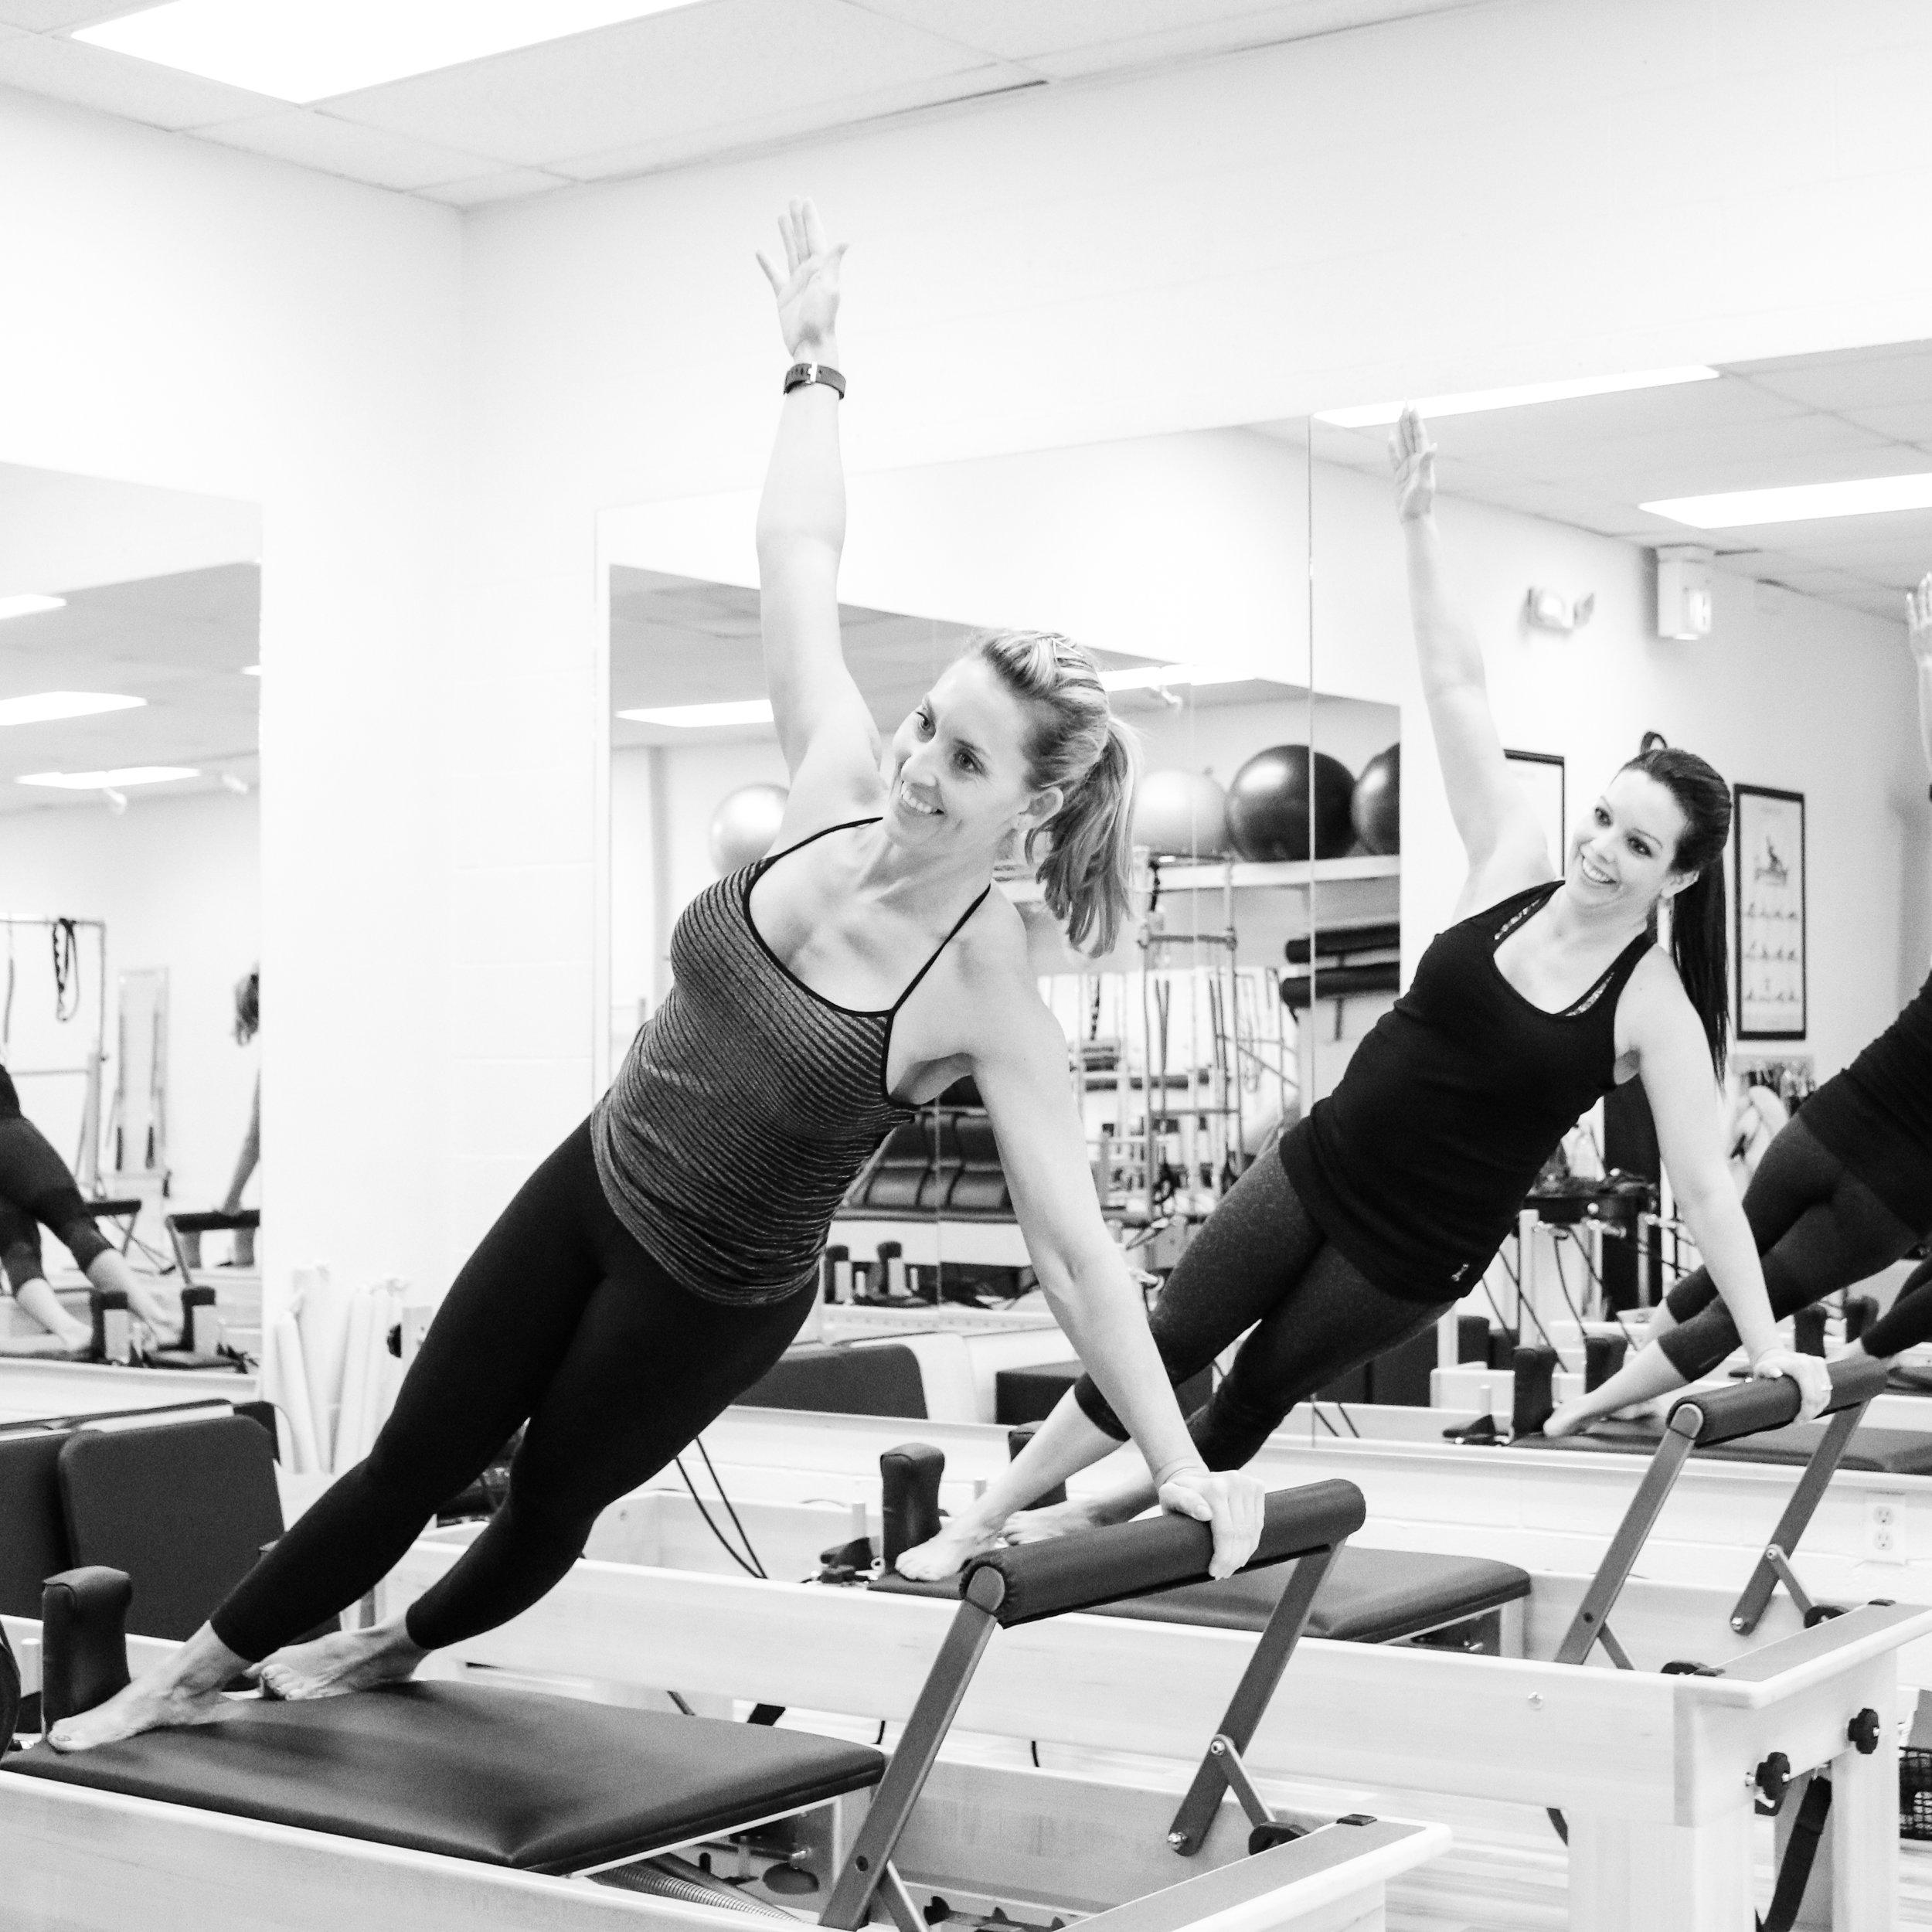 Duet Pilates for Two - 1 session - $50 ea Nikki / $50 ea Marie5 sessions - $225 ea Nikki / $225 ea Marie10 sessions - $400 ea Nikki / $400 ea Marie